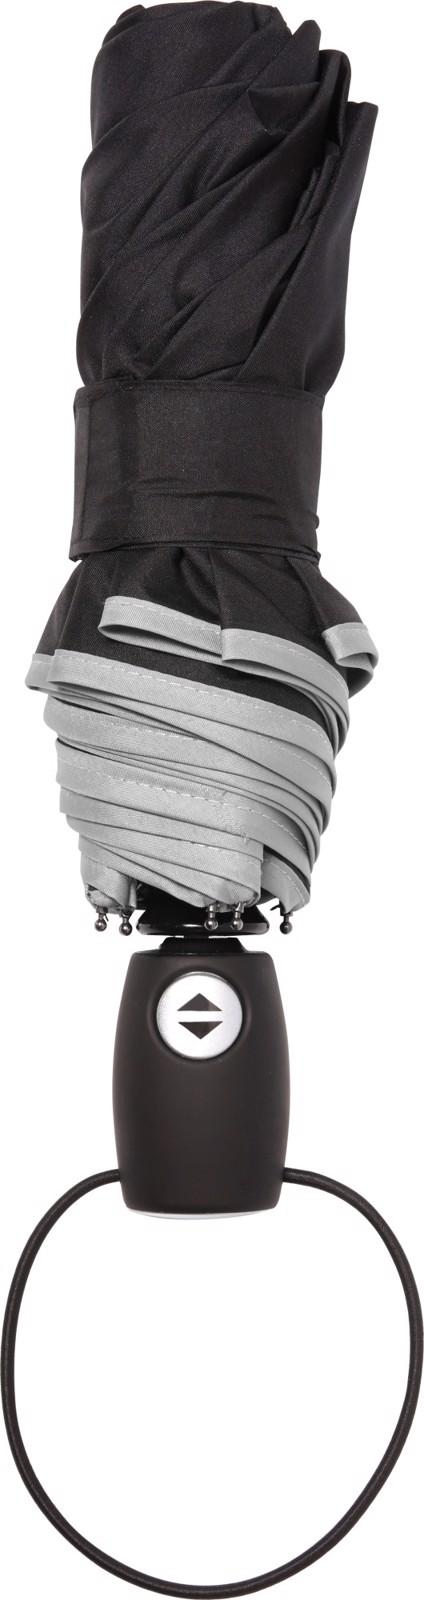 Pongee (190T) umbrella - Light Grey